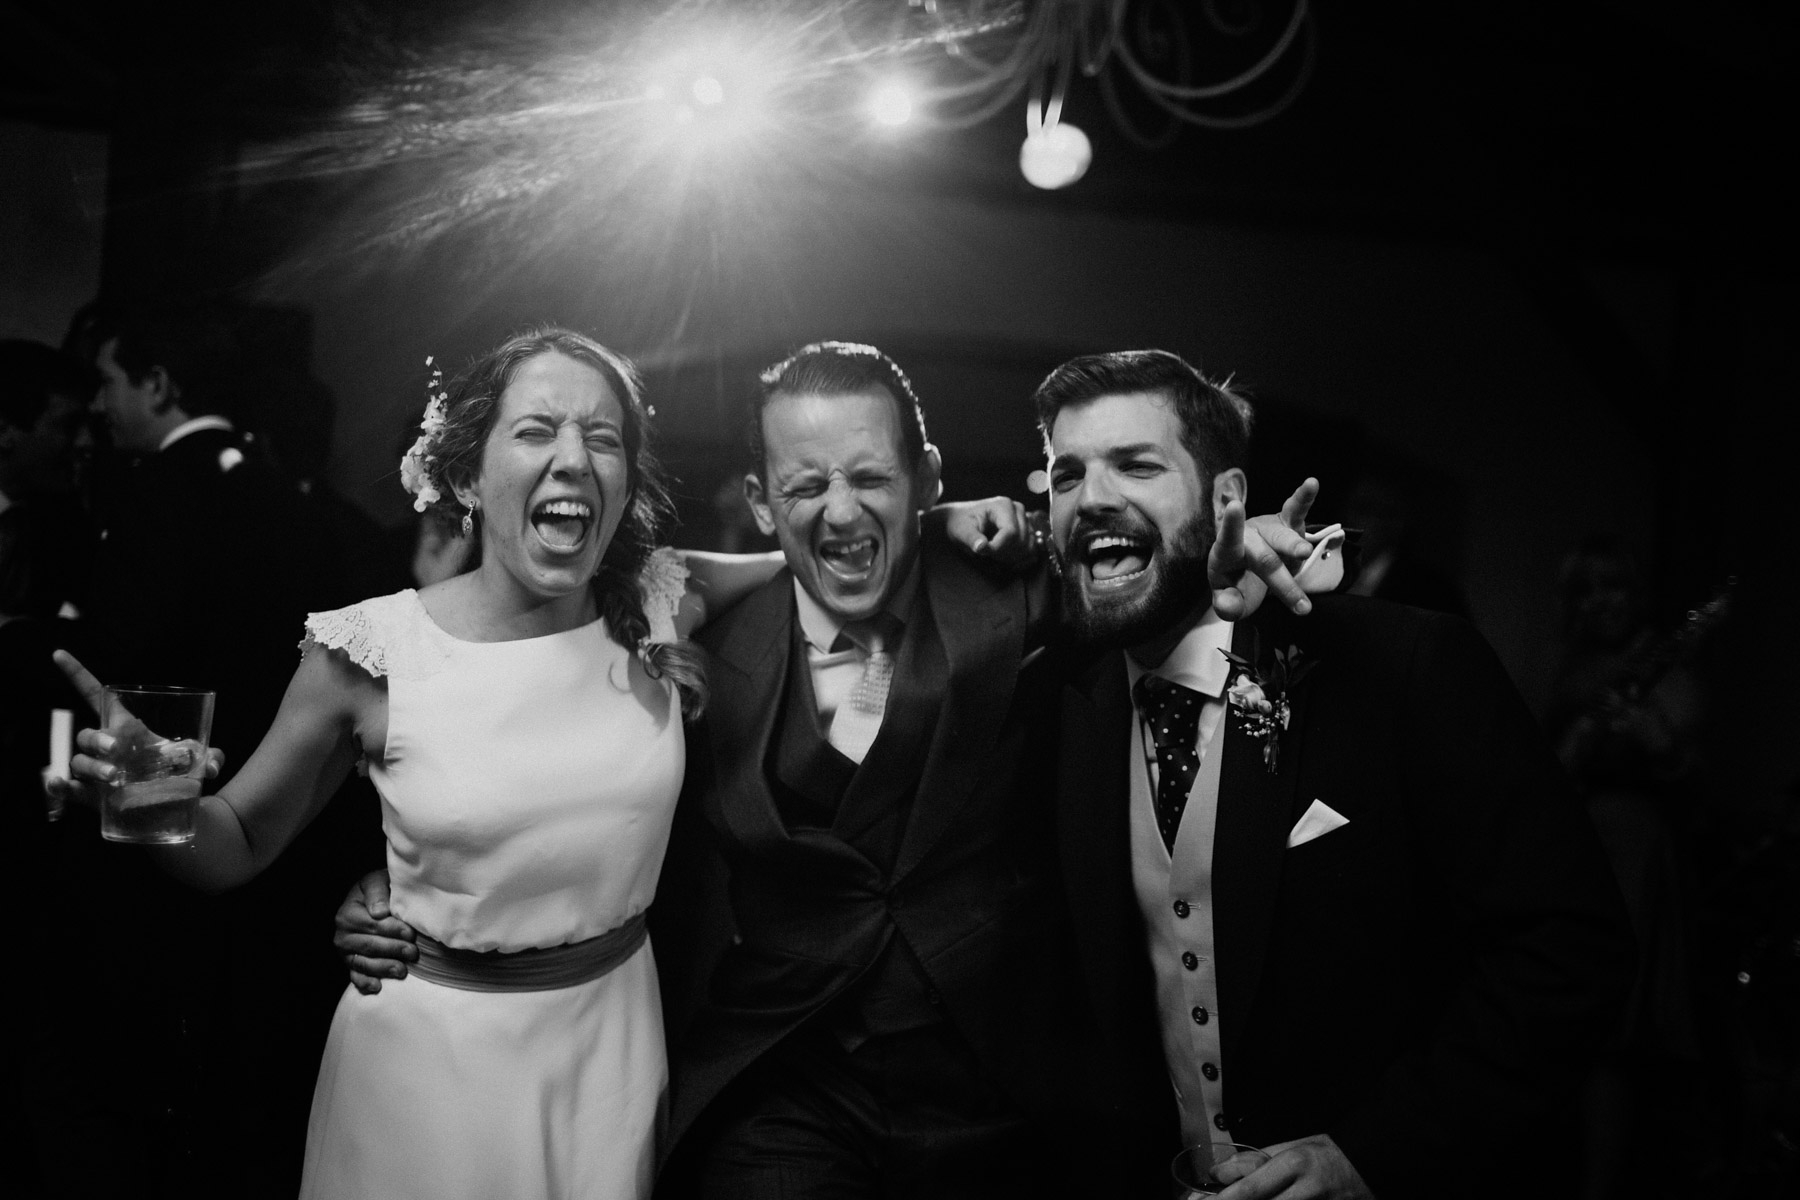 fotografo de bodas Jairo Crena-177